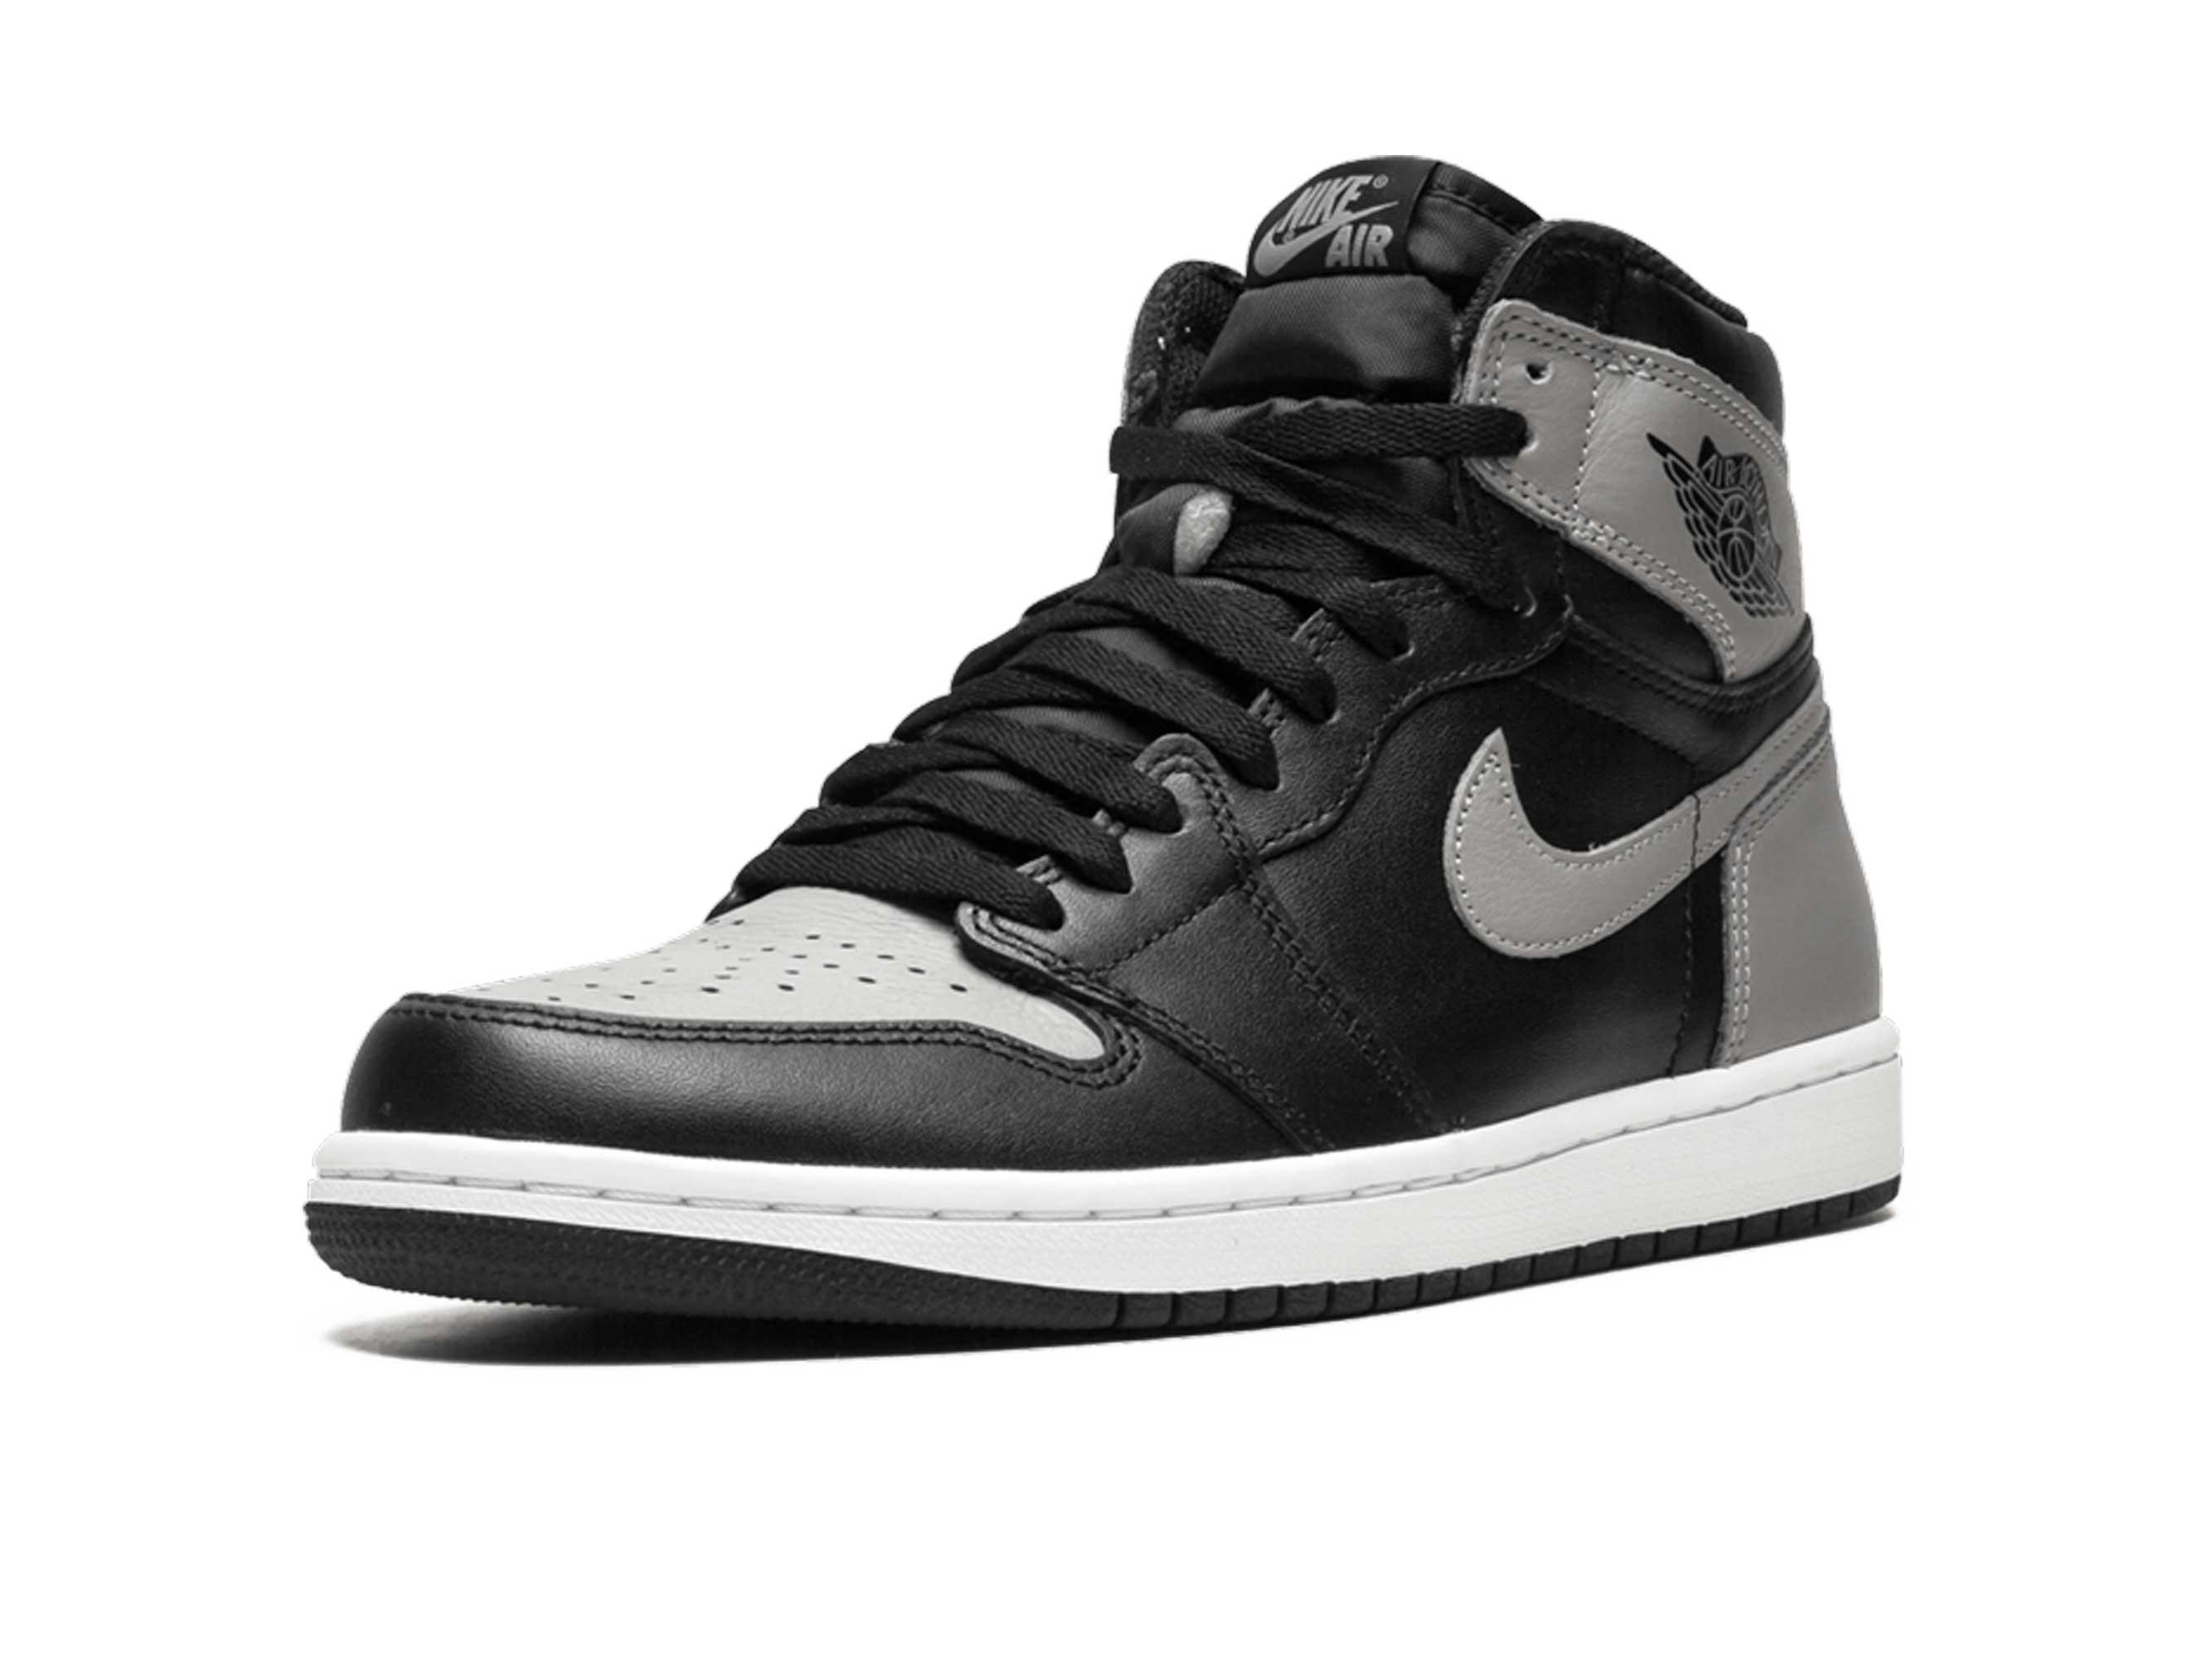 nike air Jordan 1 retro high og shadow